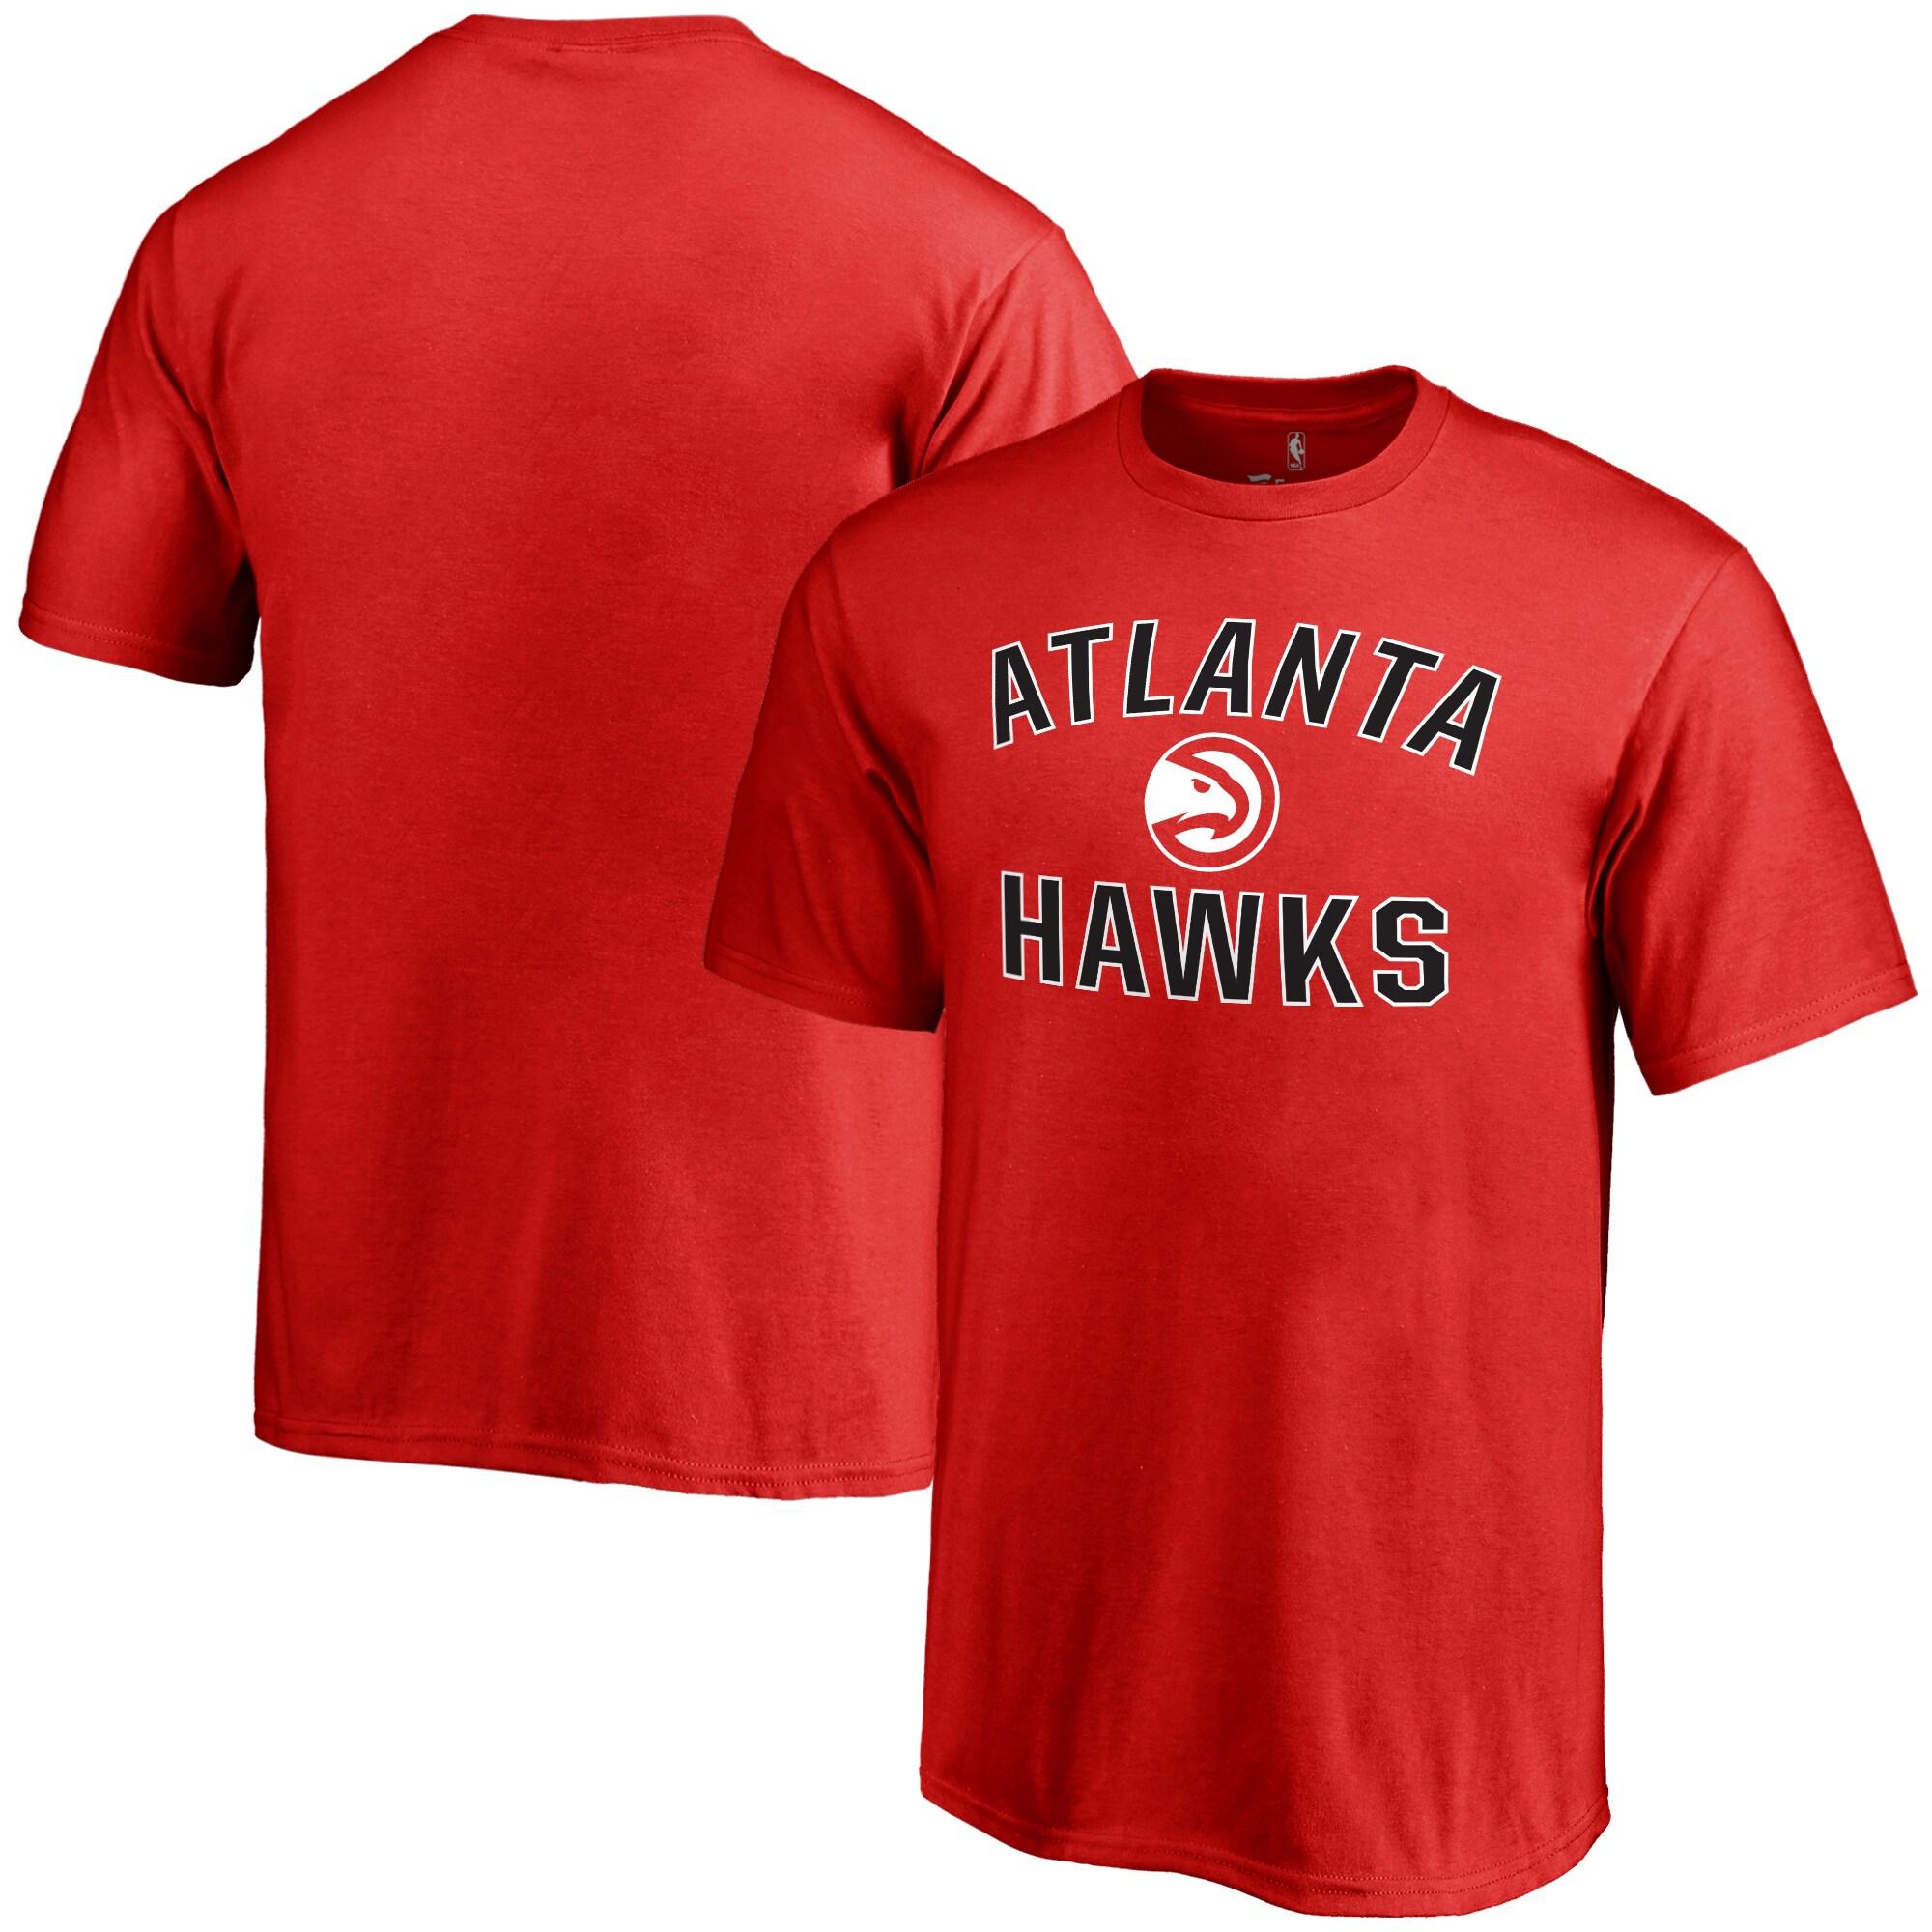 Atlanta Hawks Youth Victory Arch T-Shirt - Red